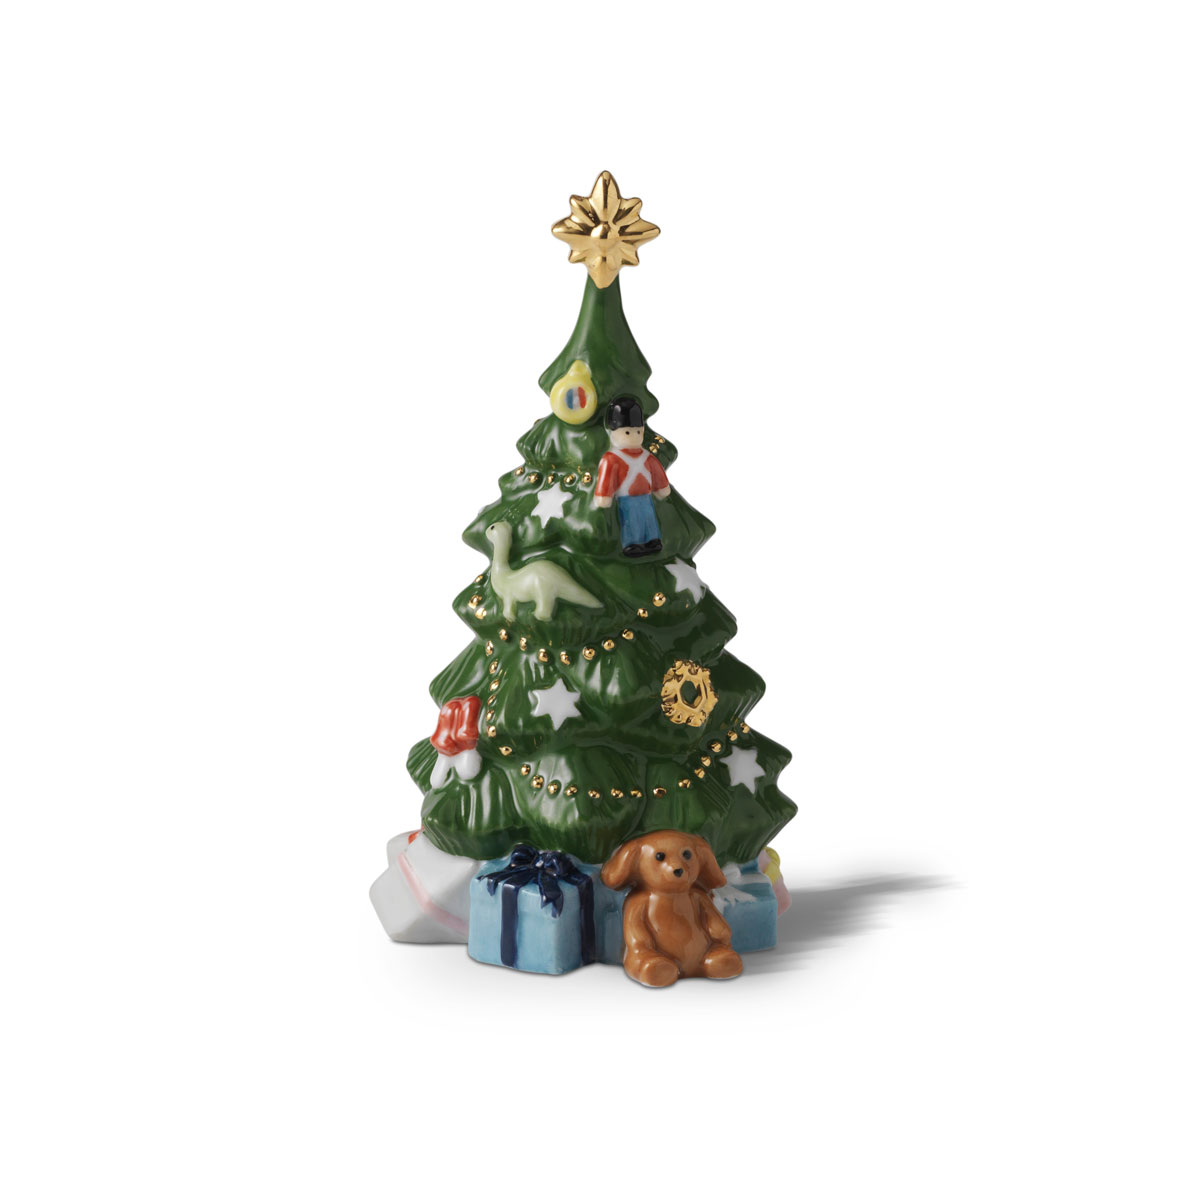 "Royal Copenhagen 2021 Christmas Tree 5.7"" Figurine"